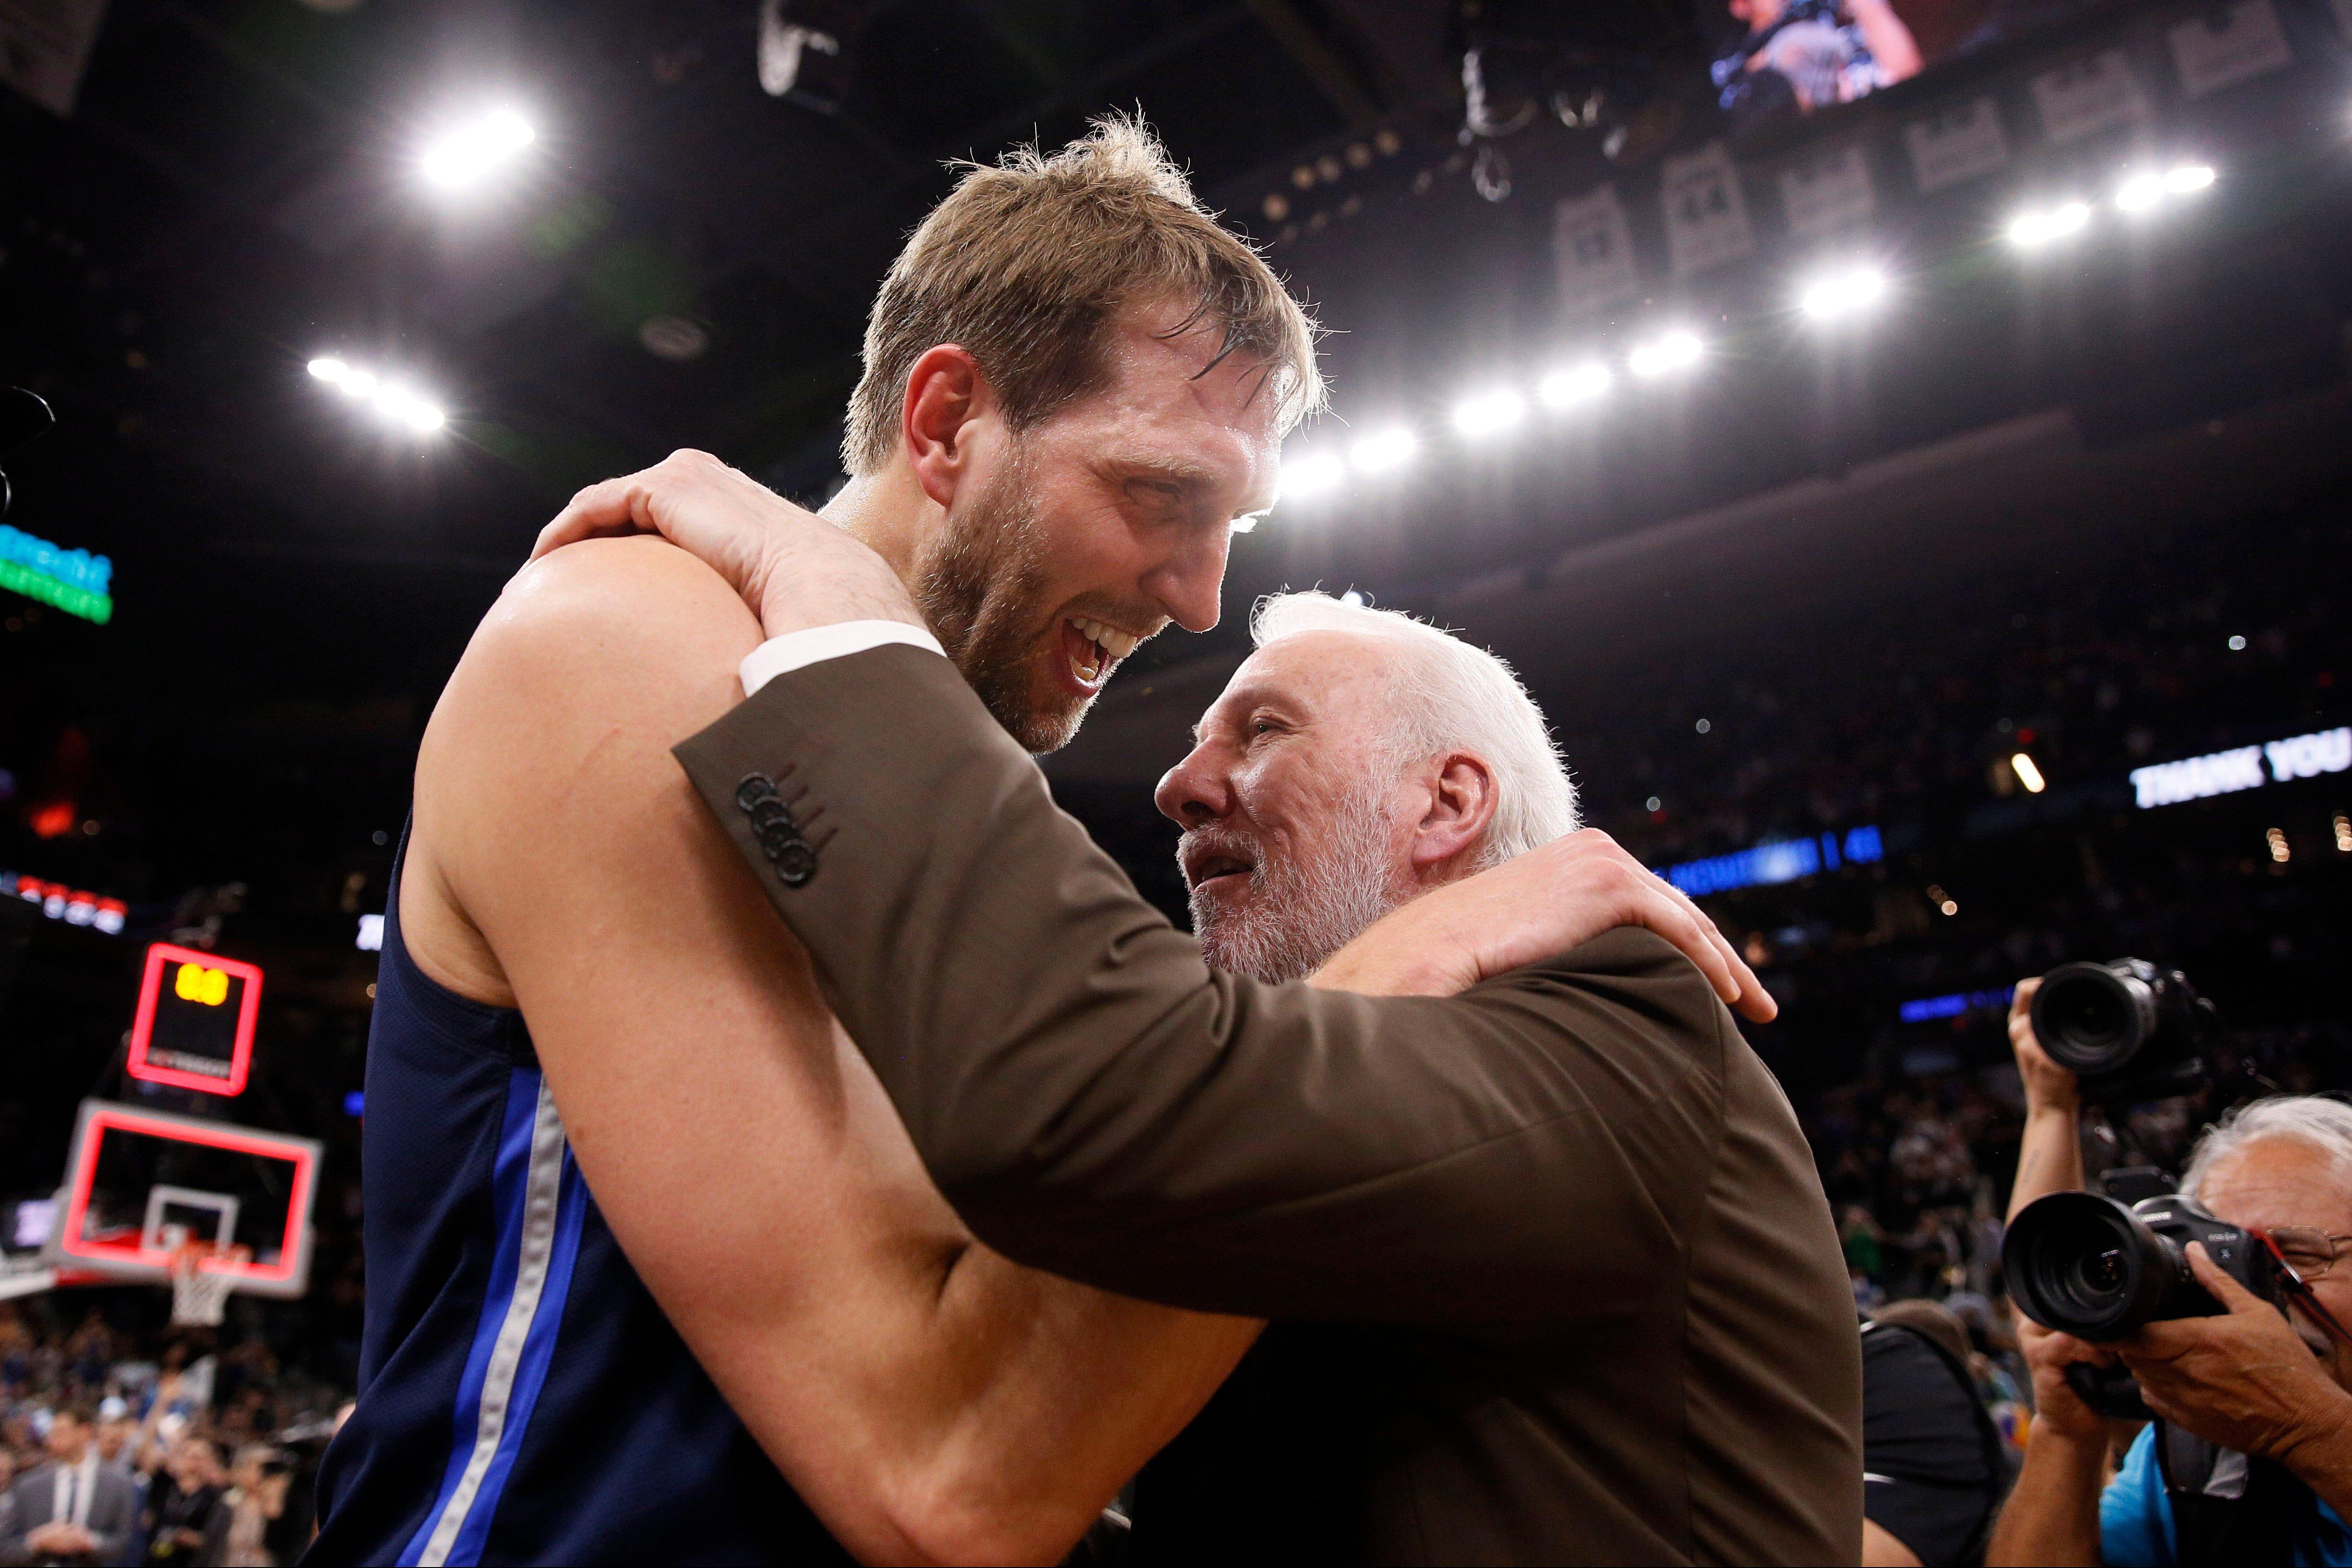 Spurs beat Mavs 105-94 in Nowitzki's final game | FOX Sports